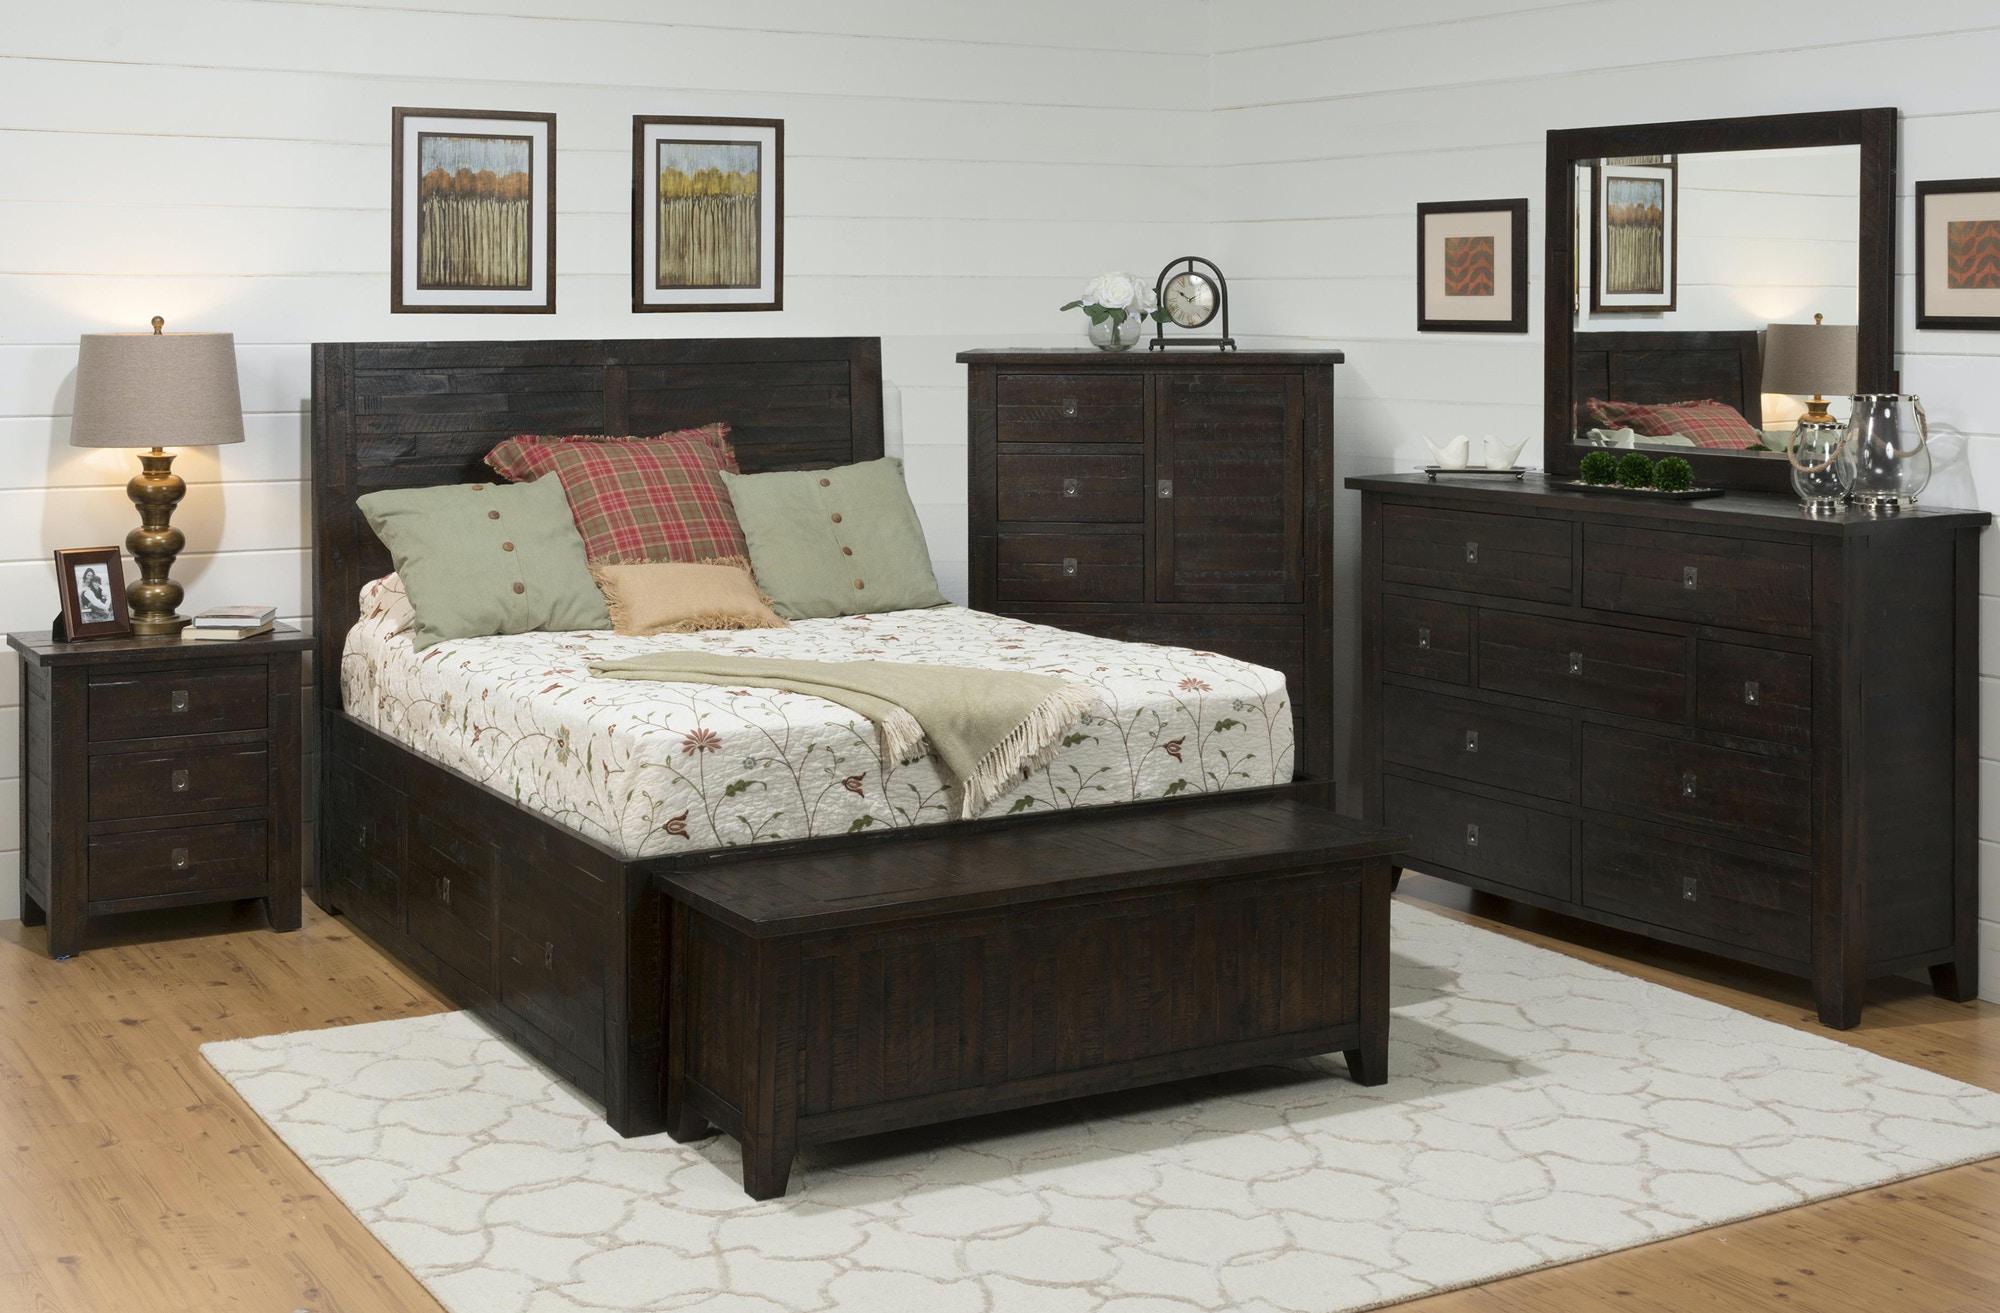 Jofran Bedroom Kona Grove Chest 053666 Furniture Fair Cincinnati Dayton Oh And Northern Ky